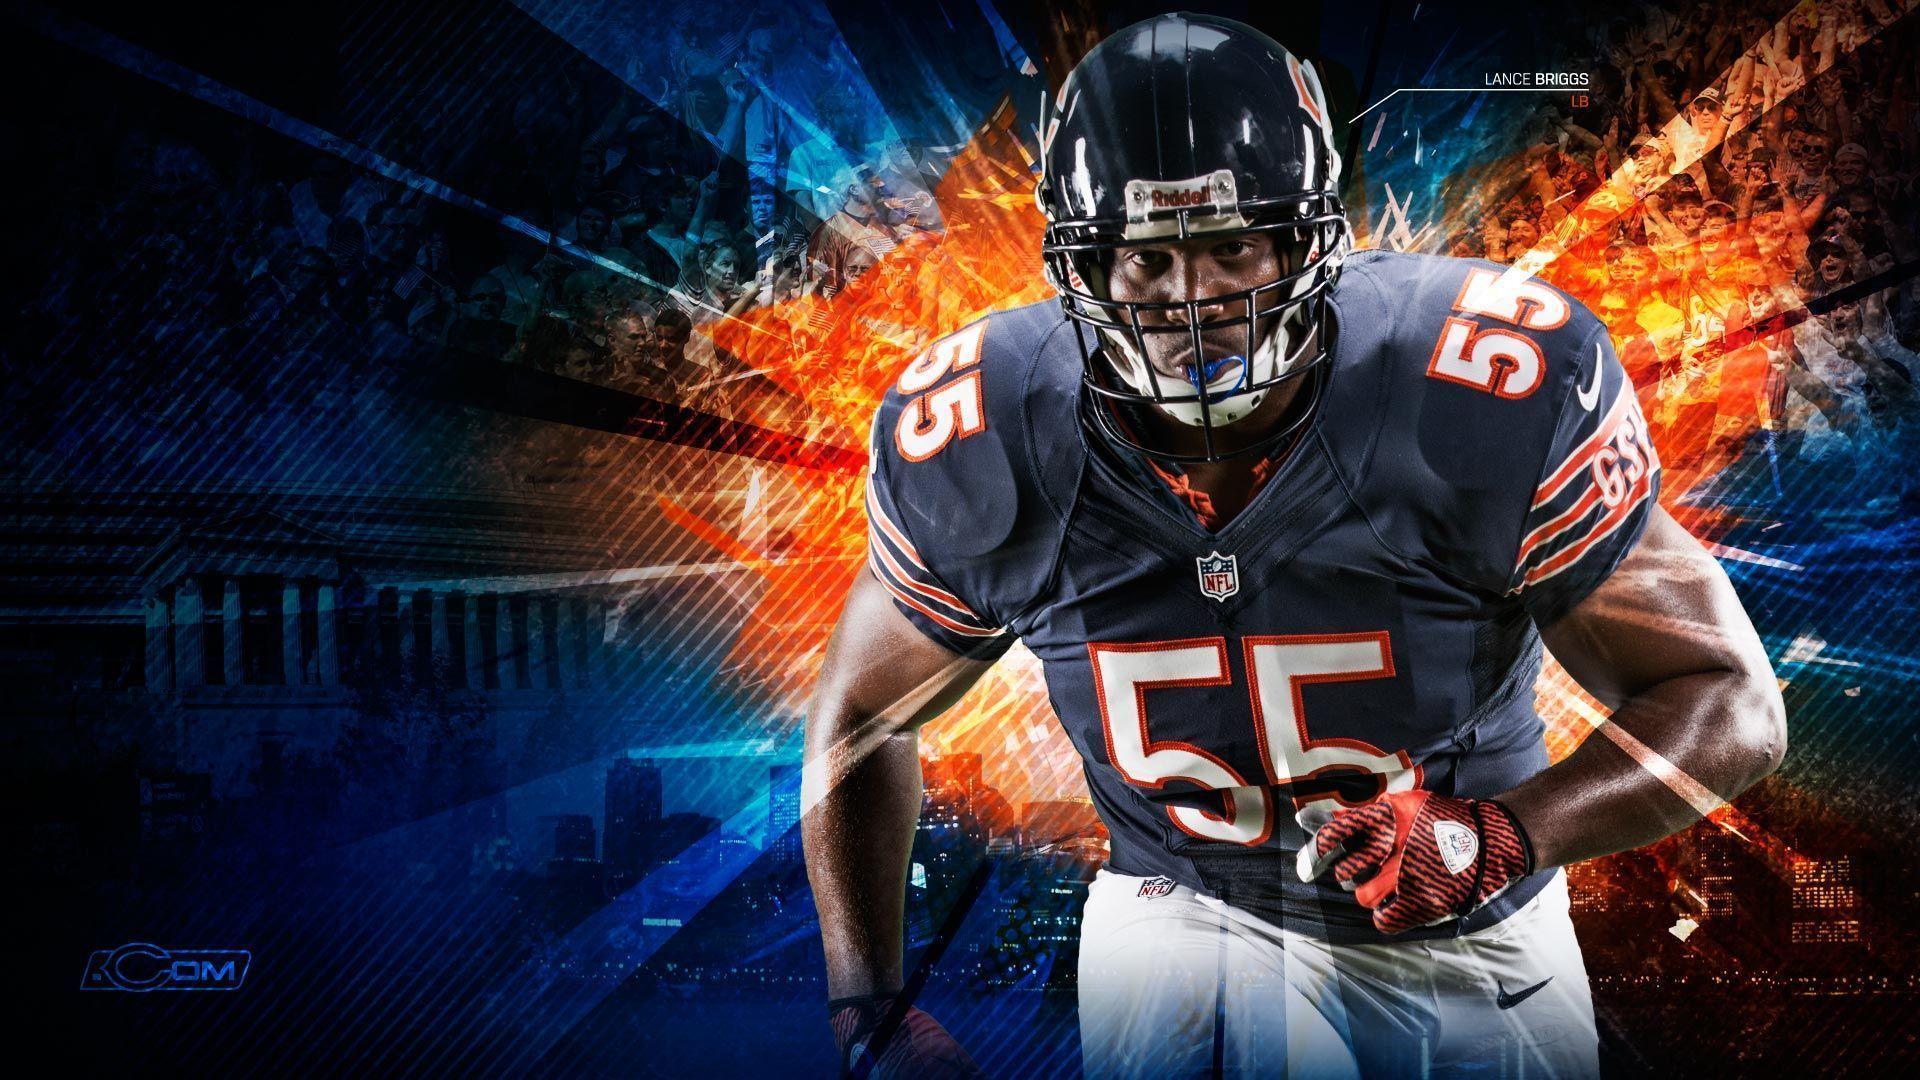 NFL Wallpaper High Quality